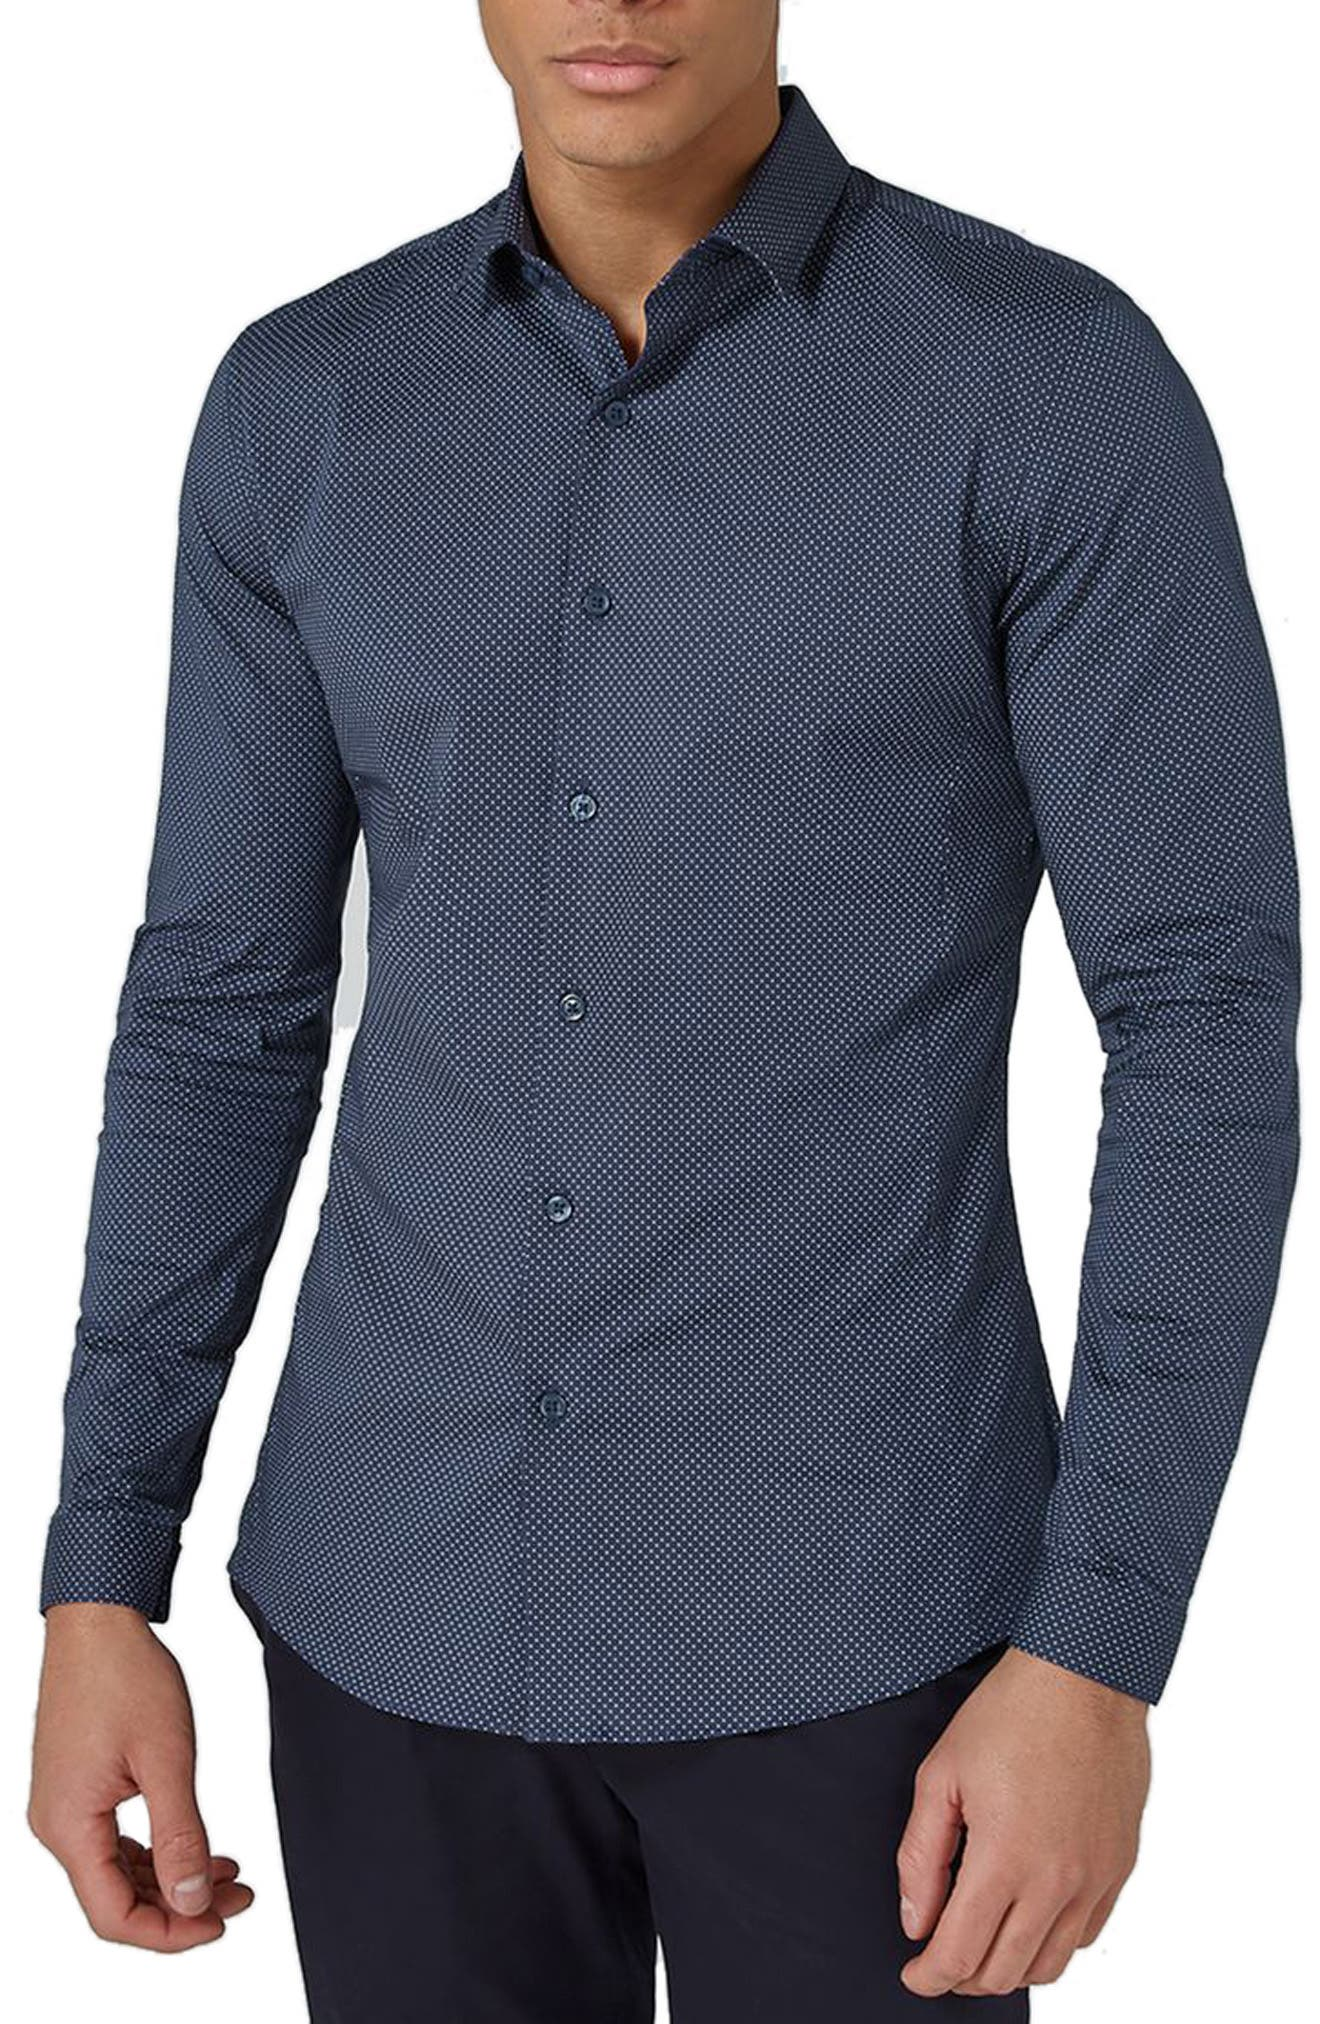 Alternate Image 1 Selected - Topman Polka Dot Stretch Smart Shirt